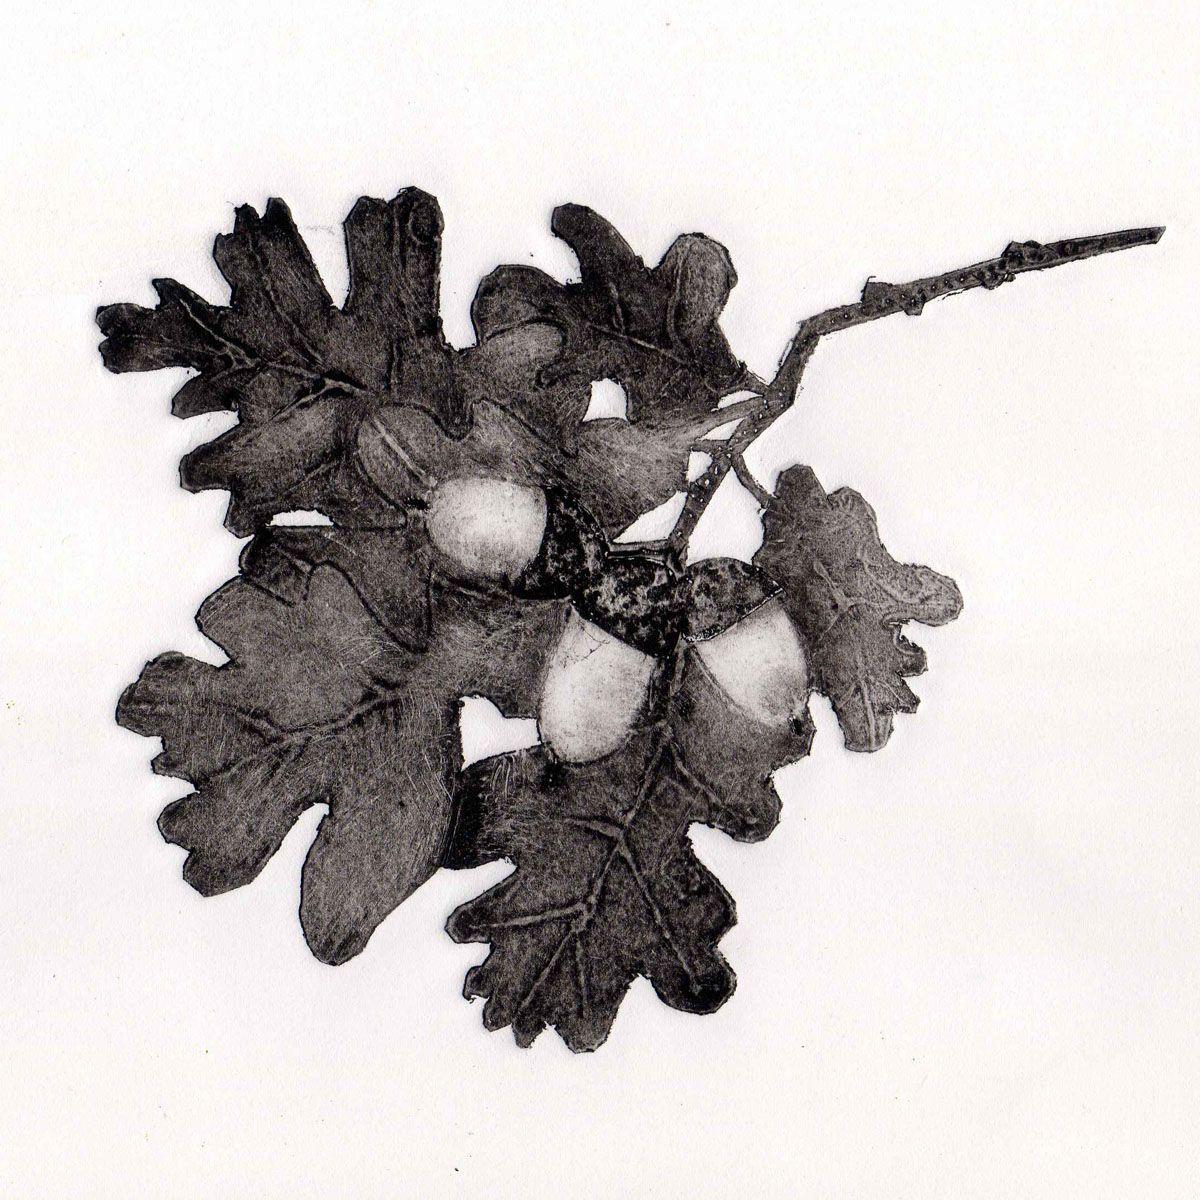 Oak collagraph